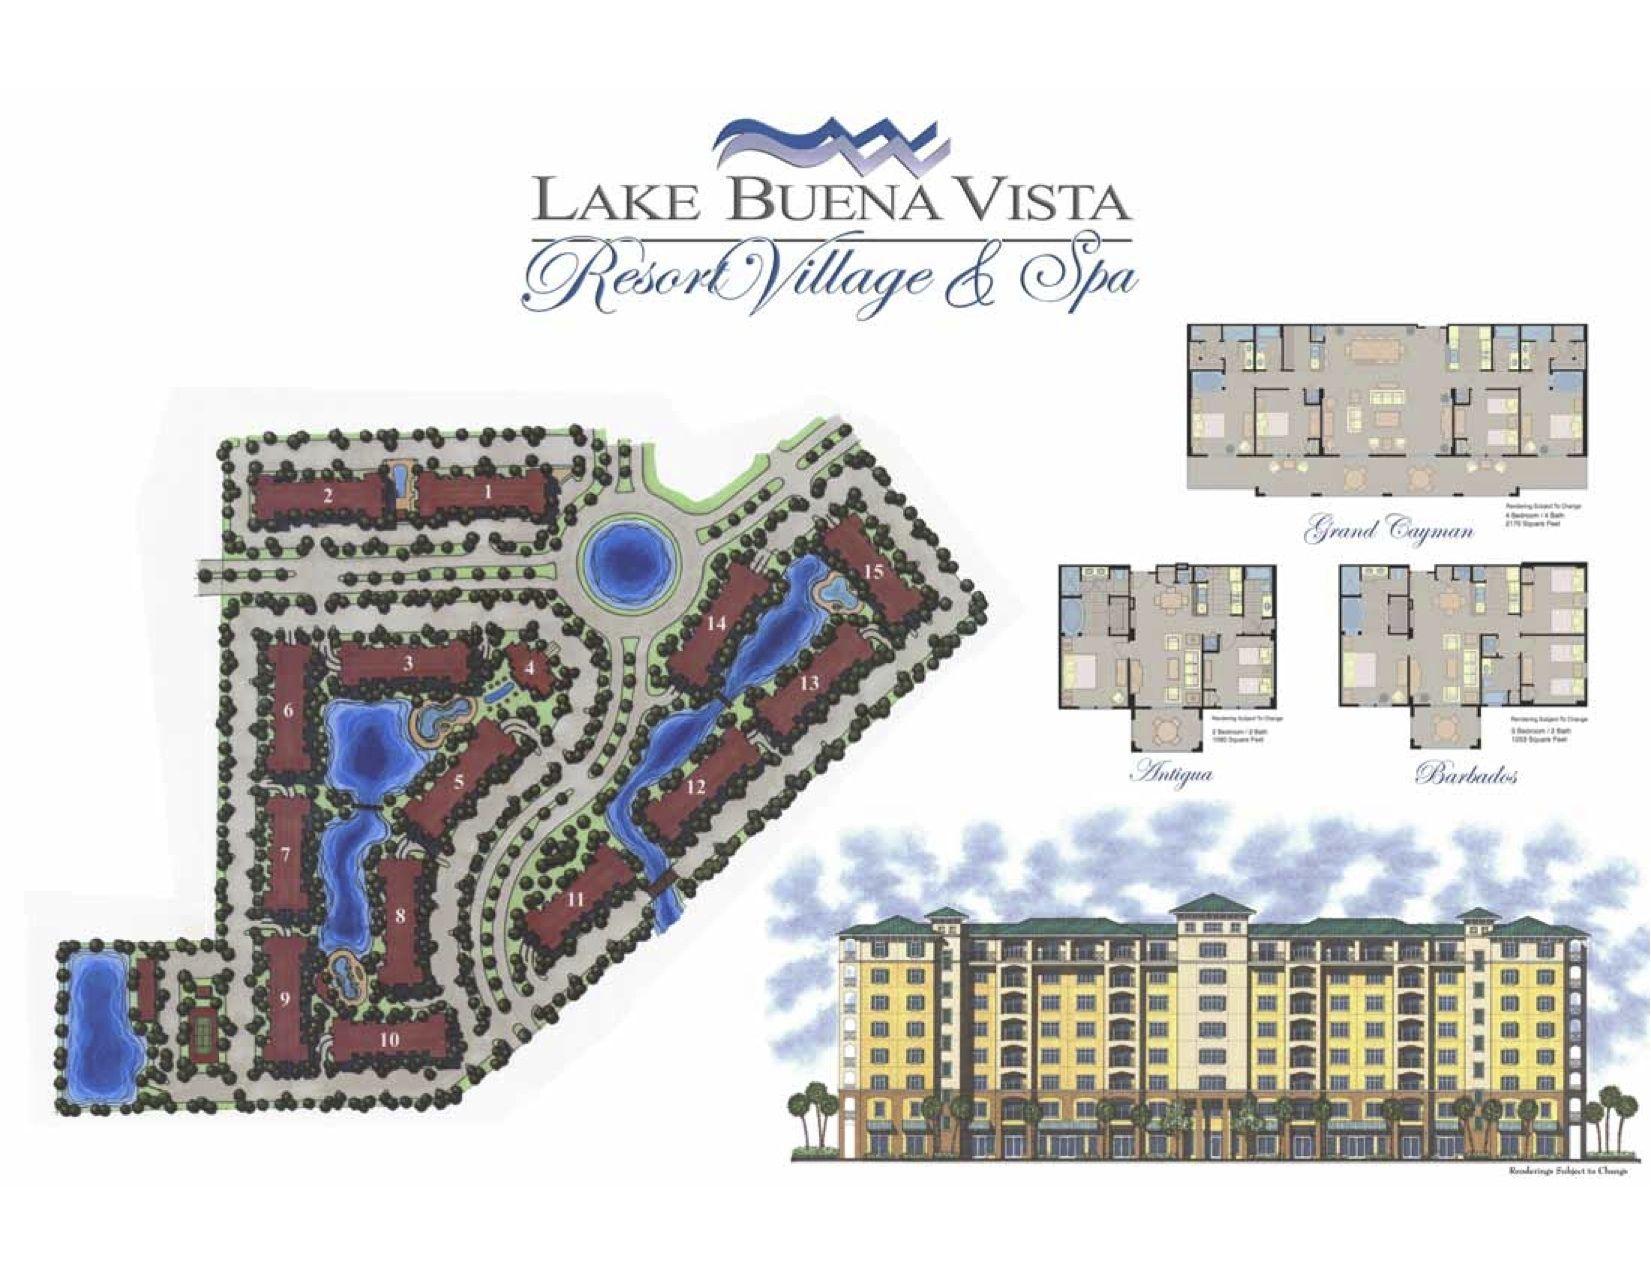 lake buena vista resort map Lake Buena Vista Resort Site Map Lake Buena Vista Resort Lake lake buena vista resort map